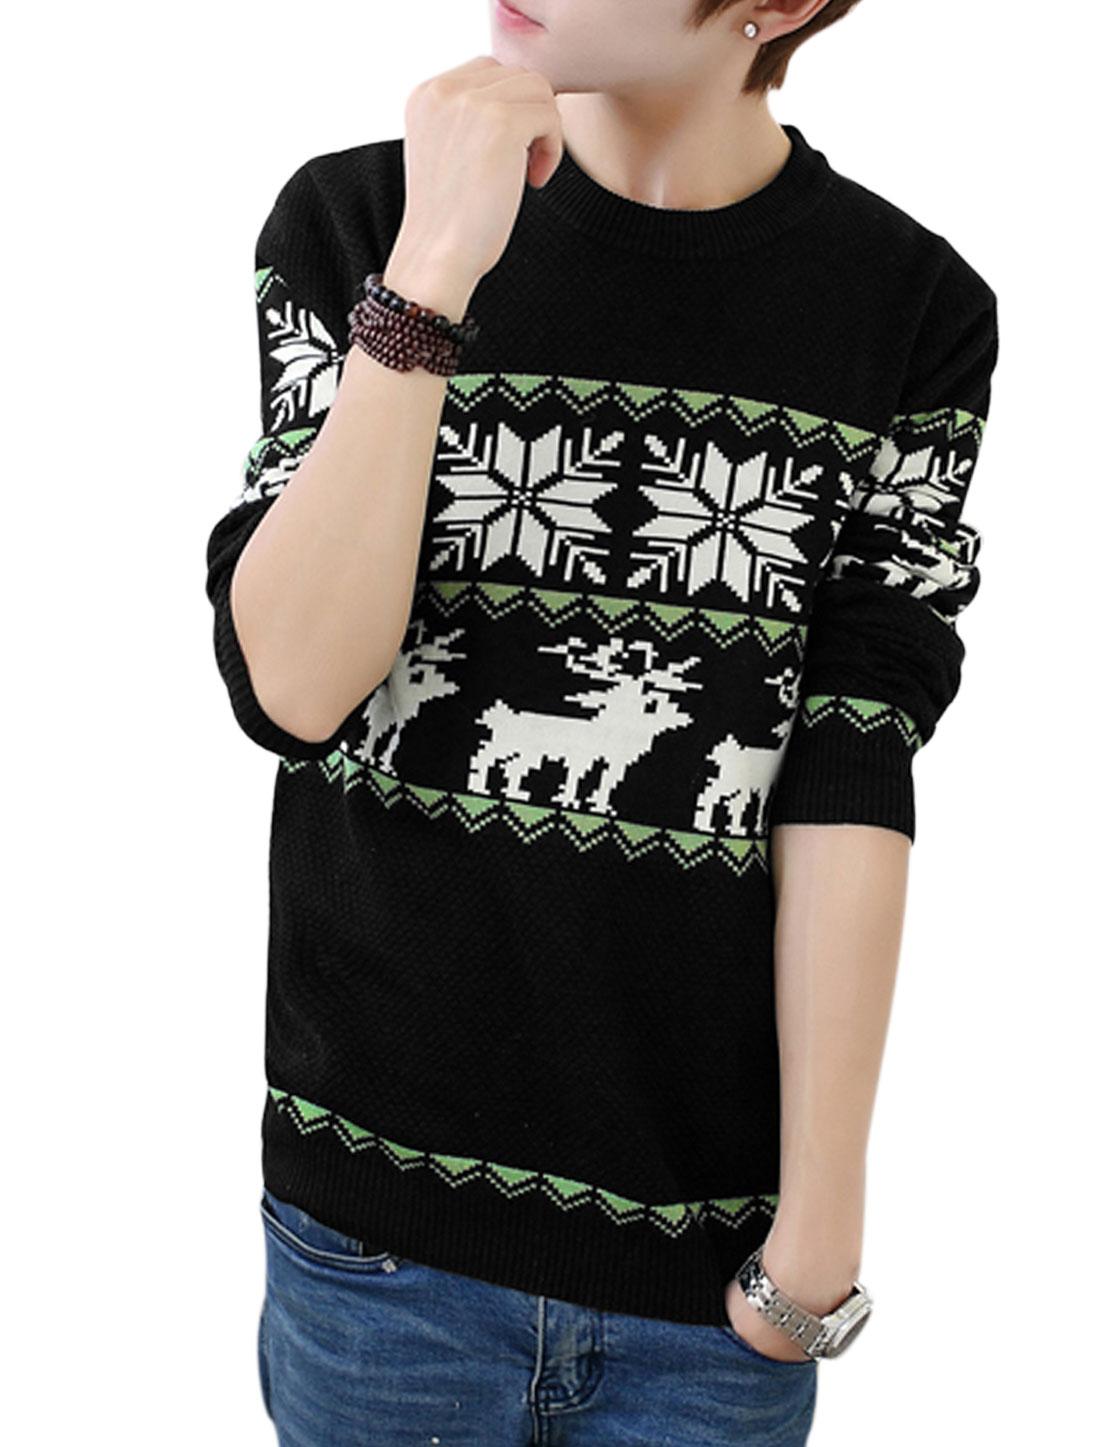 Men Black Slipover Zigzag Deer Snowflake Prints Cozy Fit Casual Sweater S